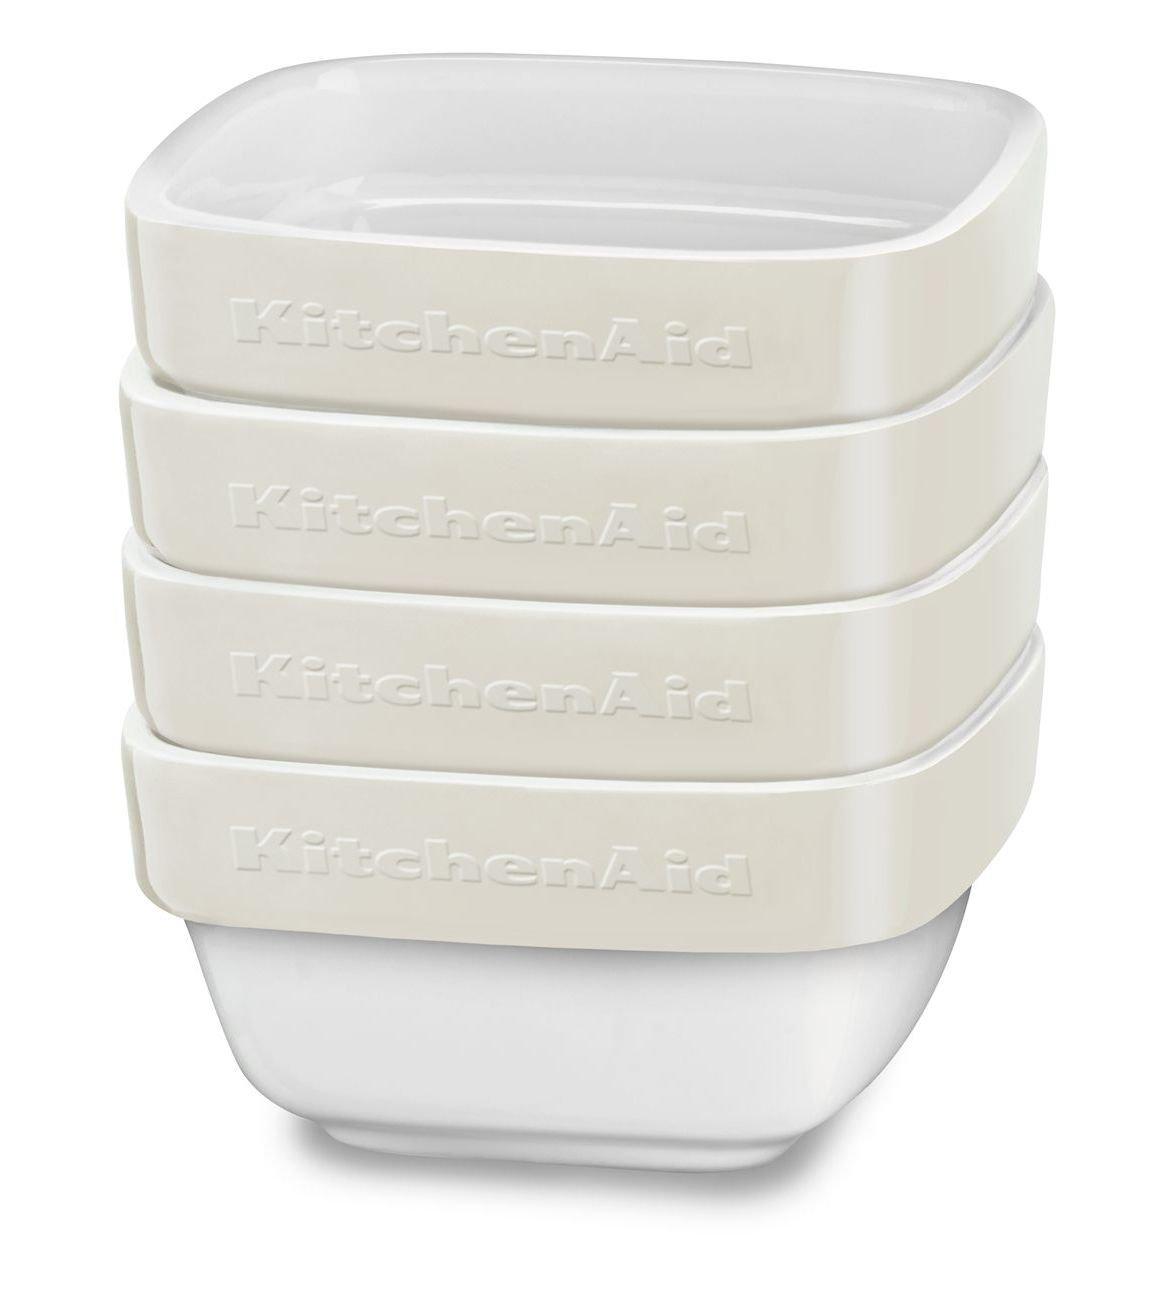 Almond Cream KitchenAid KBLR04RMAC 4 Piece Ceramic Ramekin Bakeware Set